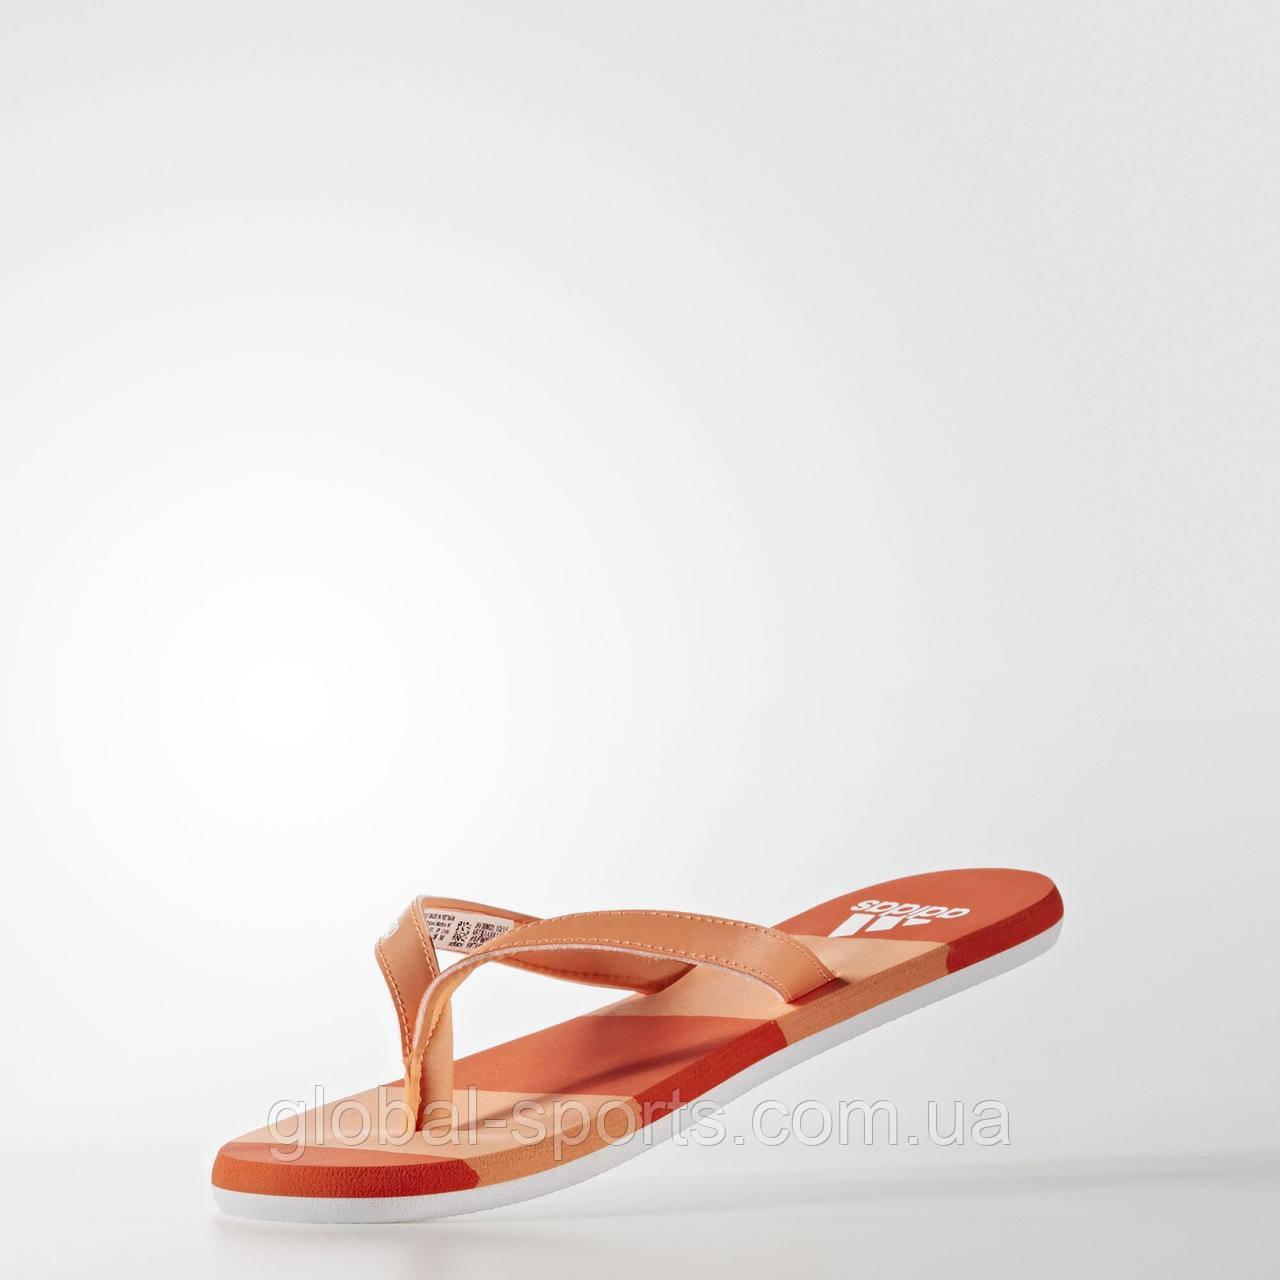 Женские вьетнамки Adidas Eezay Striped Marble(Артикул:BA8815)